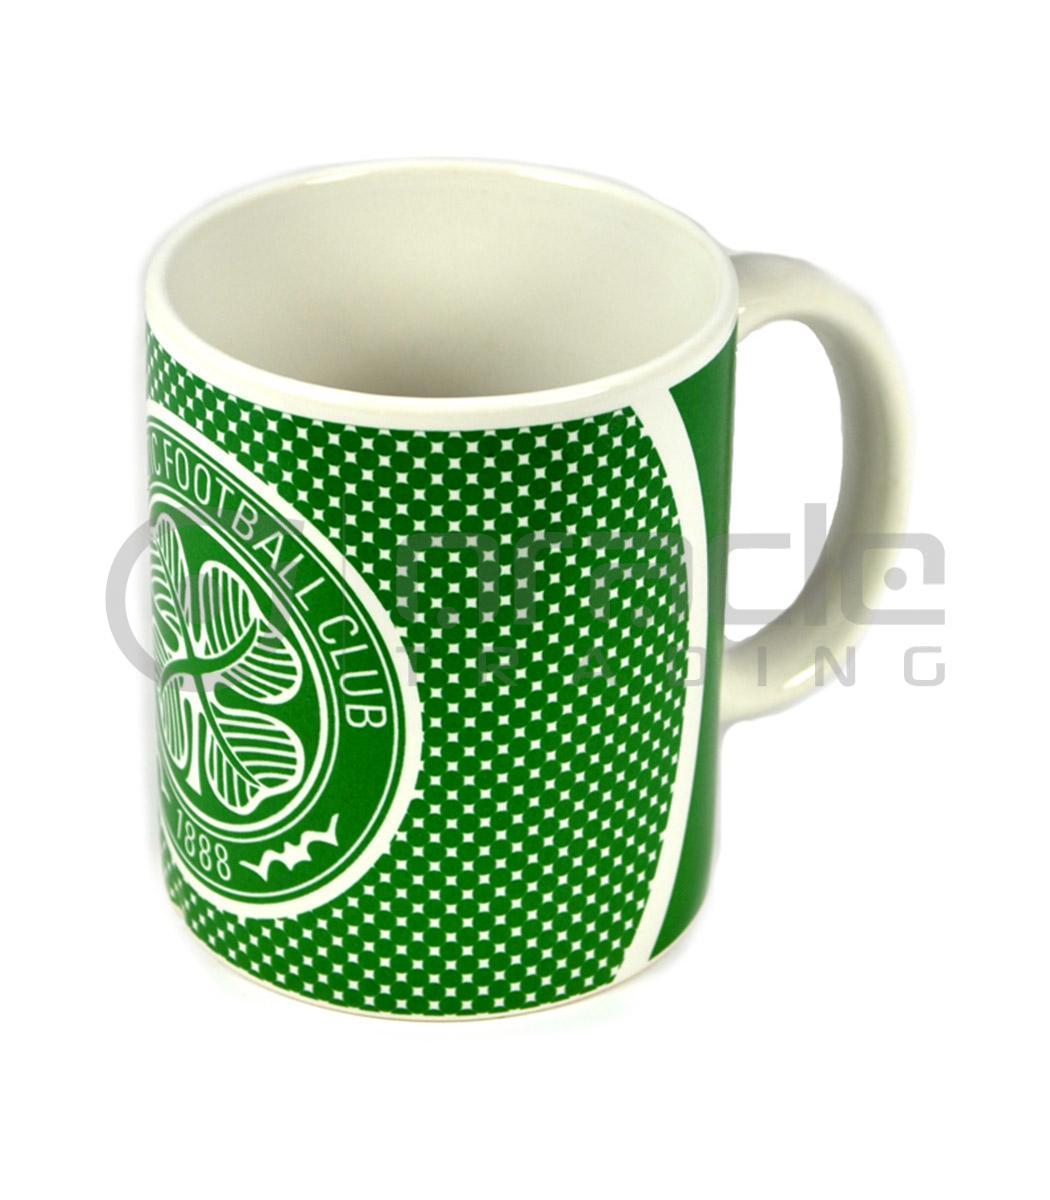 Celtic Mug - Crest